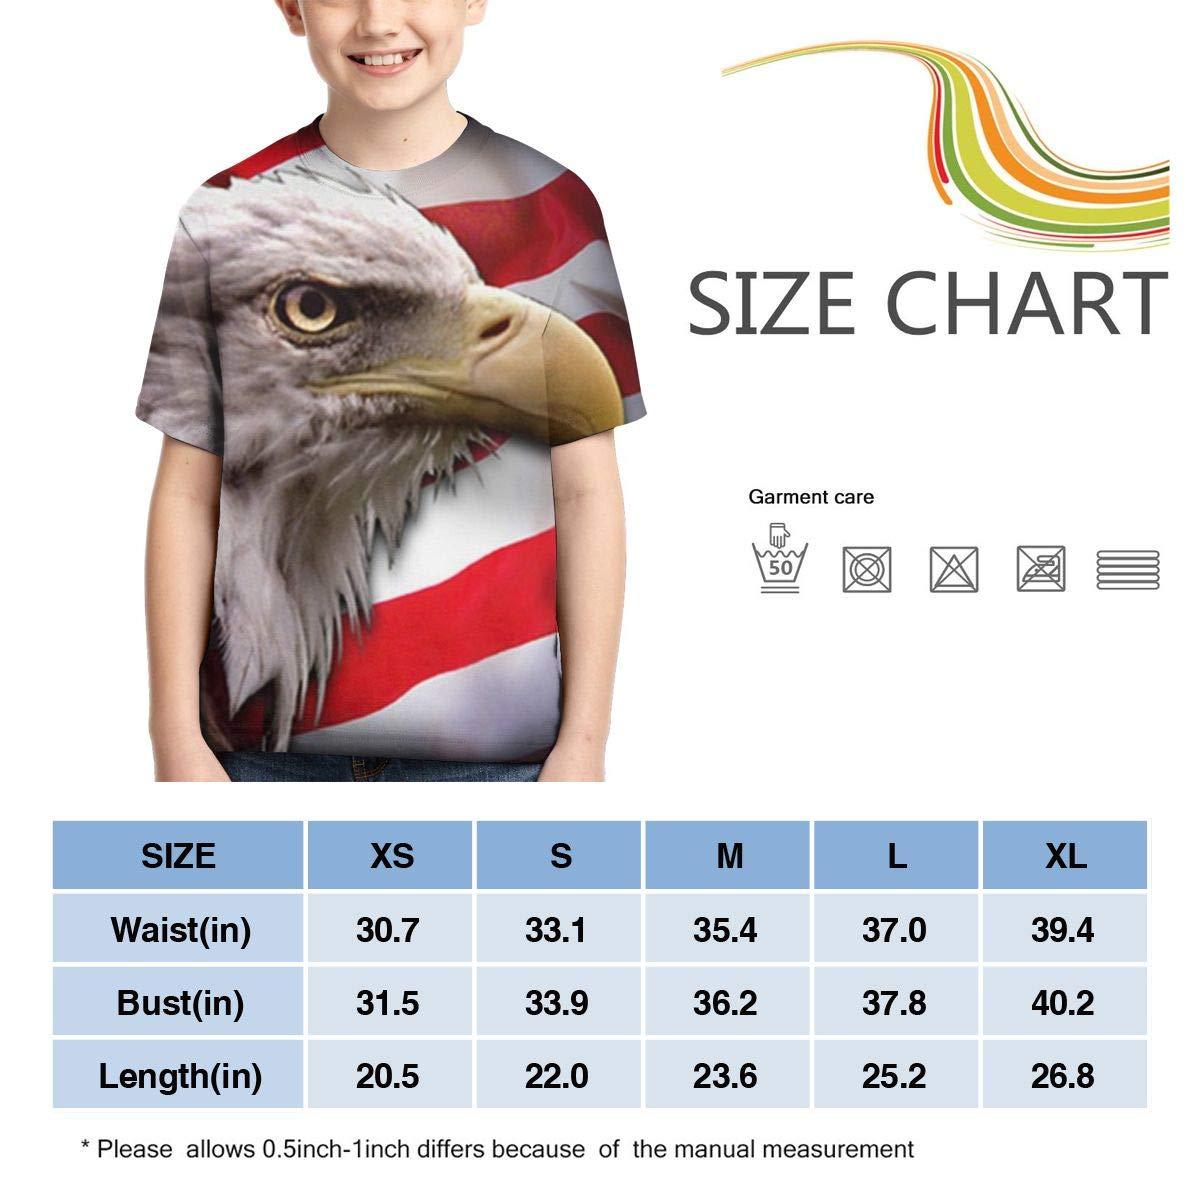 American Eagle Flag Unisex Children Teens Crewneck Short Sleeved T-Shirt Girl Boys Graphic Tee Shirt Tops S